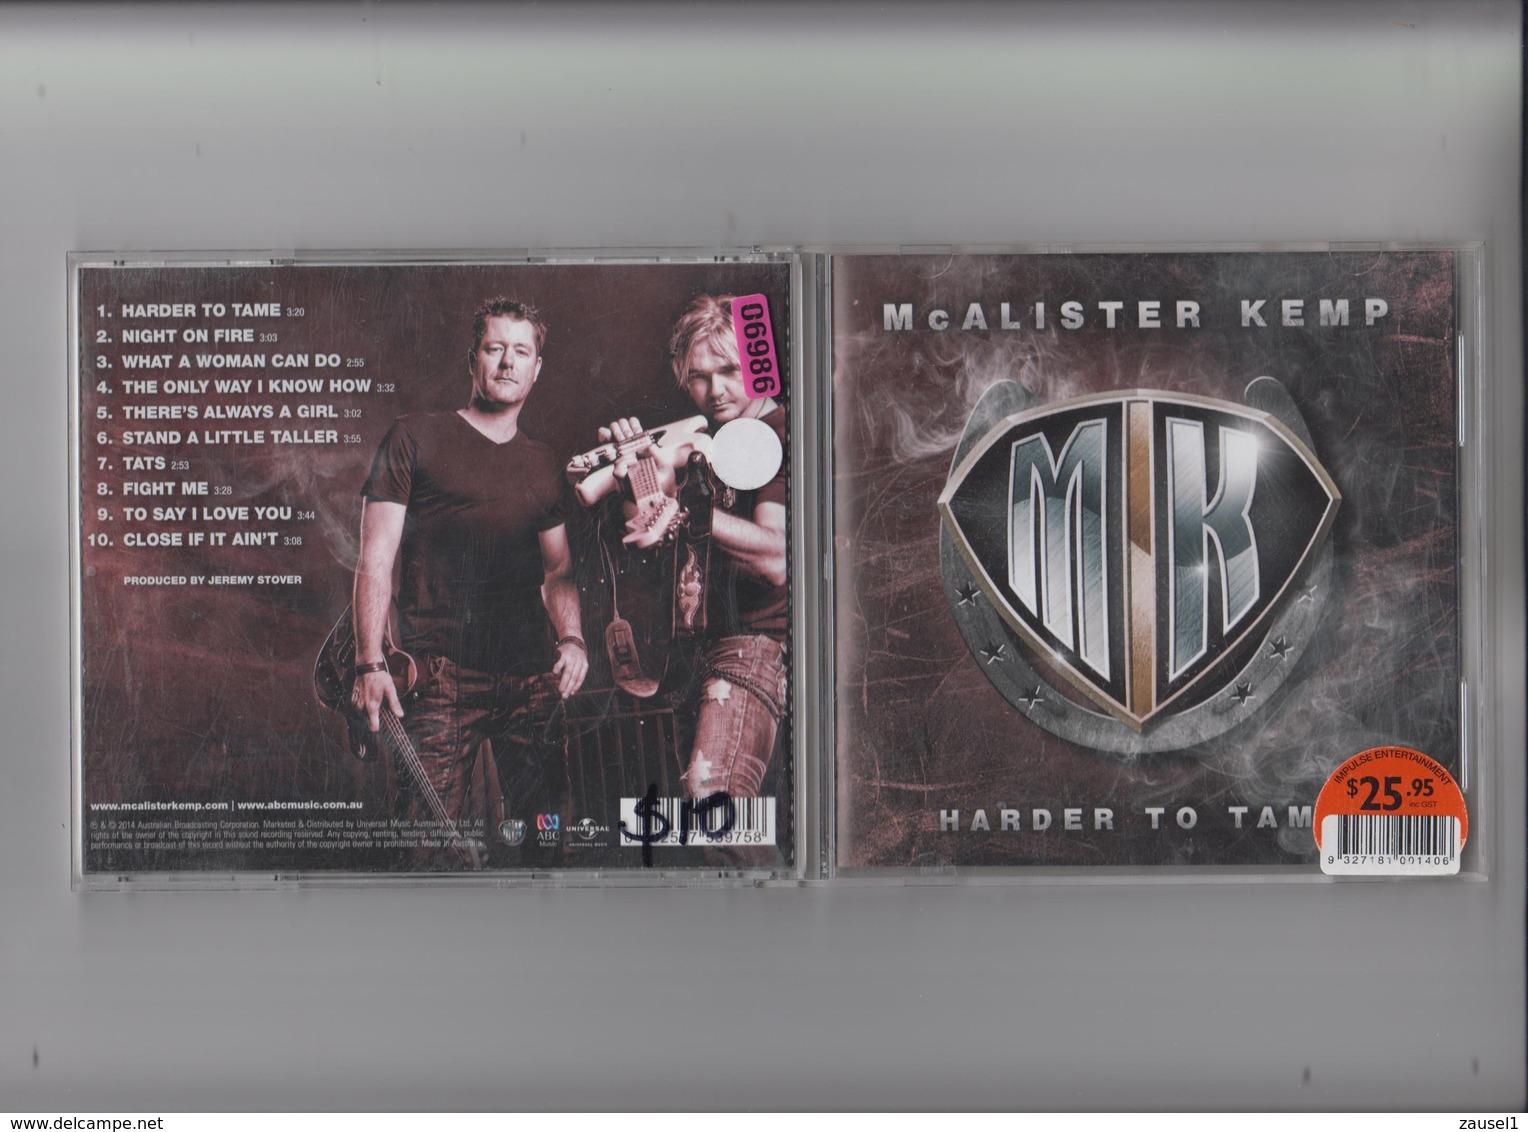 McAlister Kemp - Harder To Tame - Original CD - Country & Folk